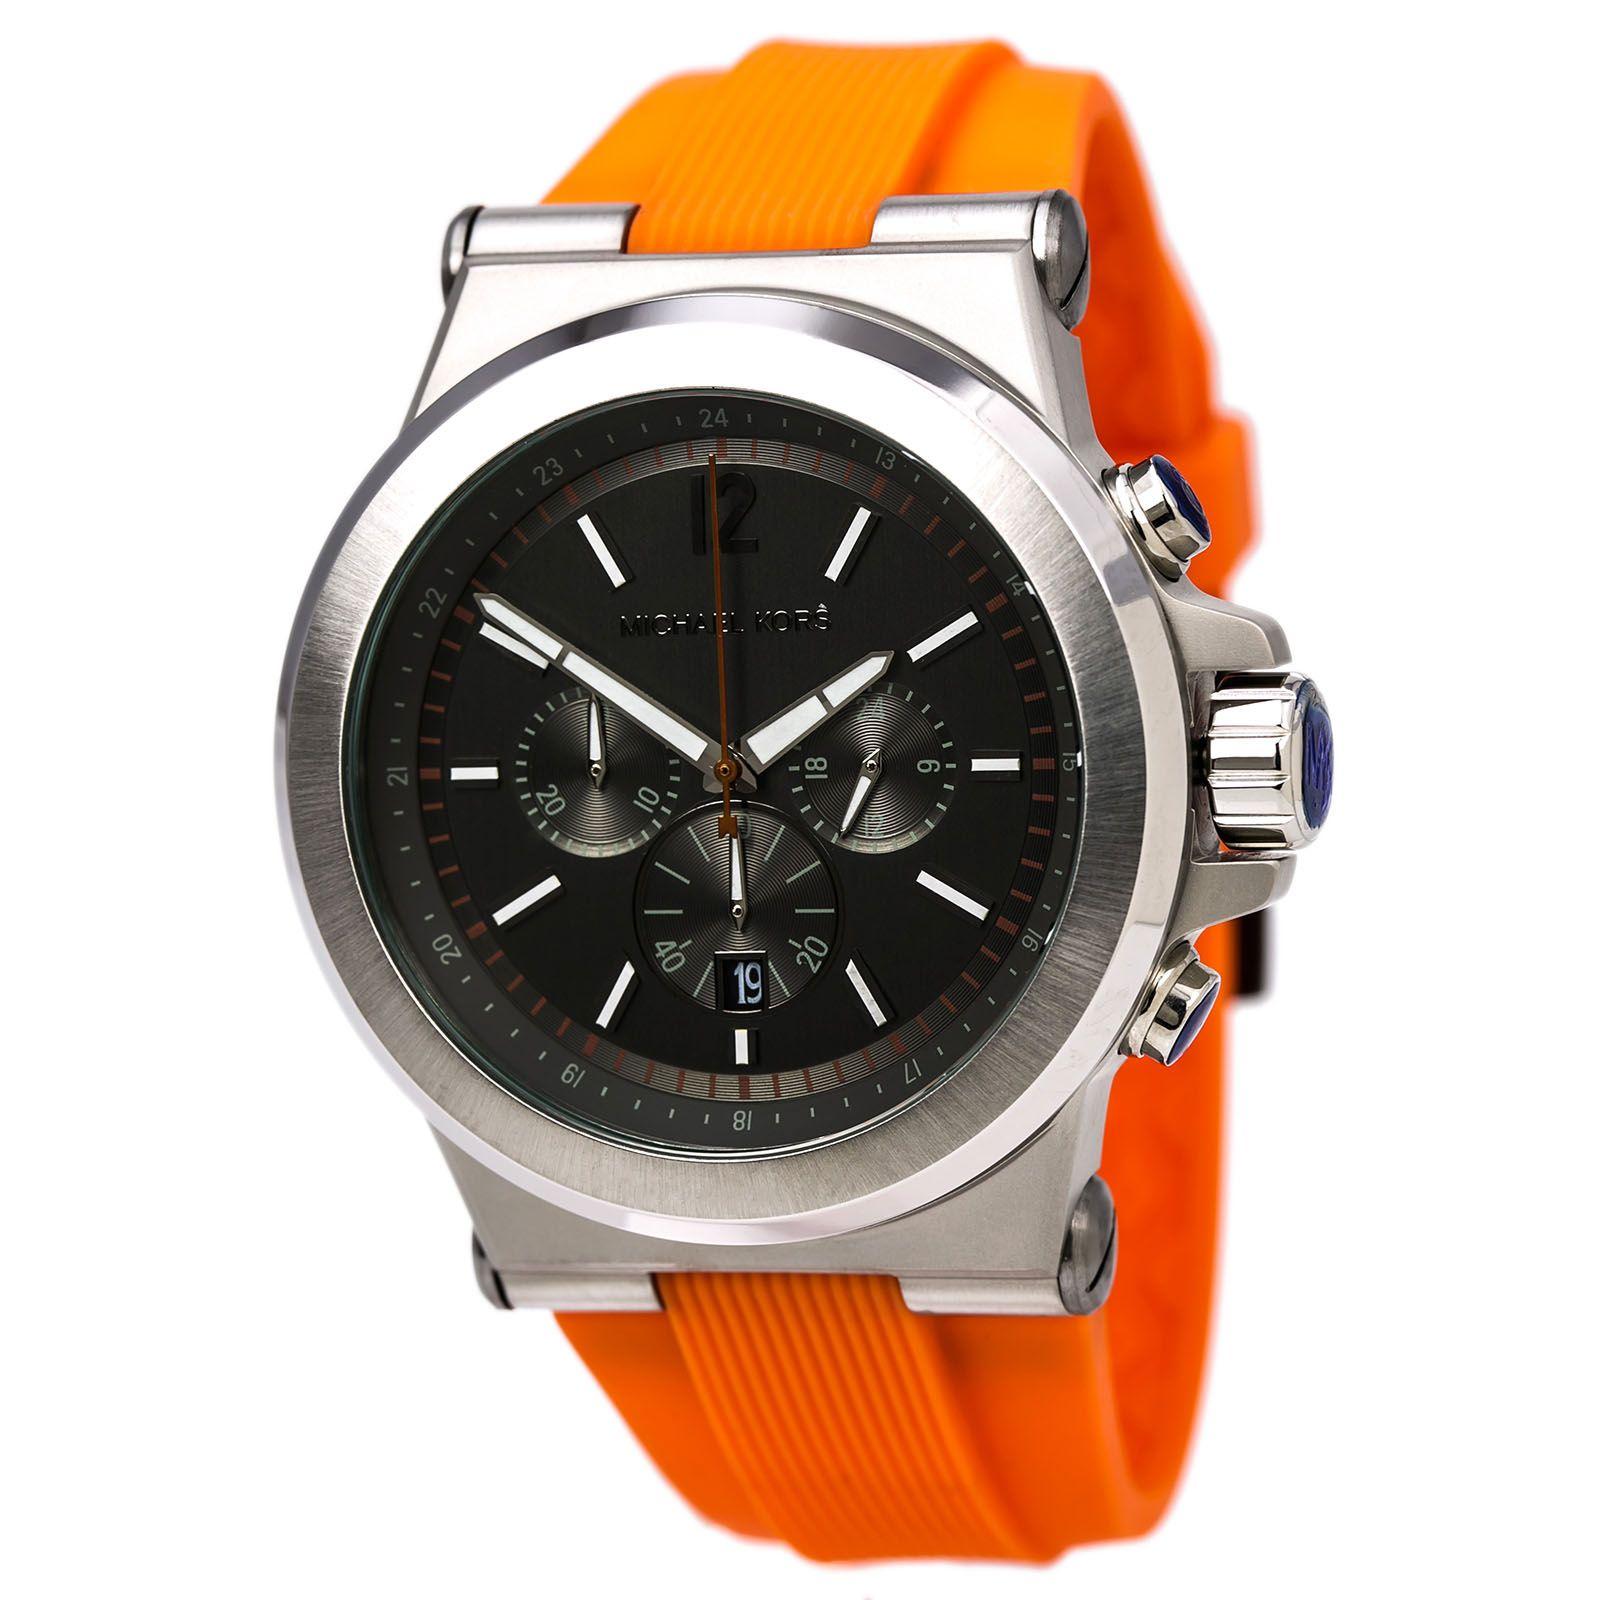 ef3e4c28e83 Michael Kors MK8296 Men s Dylan Black Dial Black IP Steel Orange Silicone  Strap Chronograph Watch